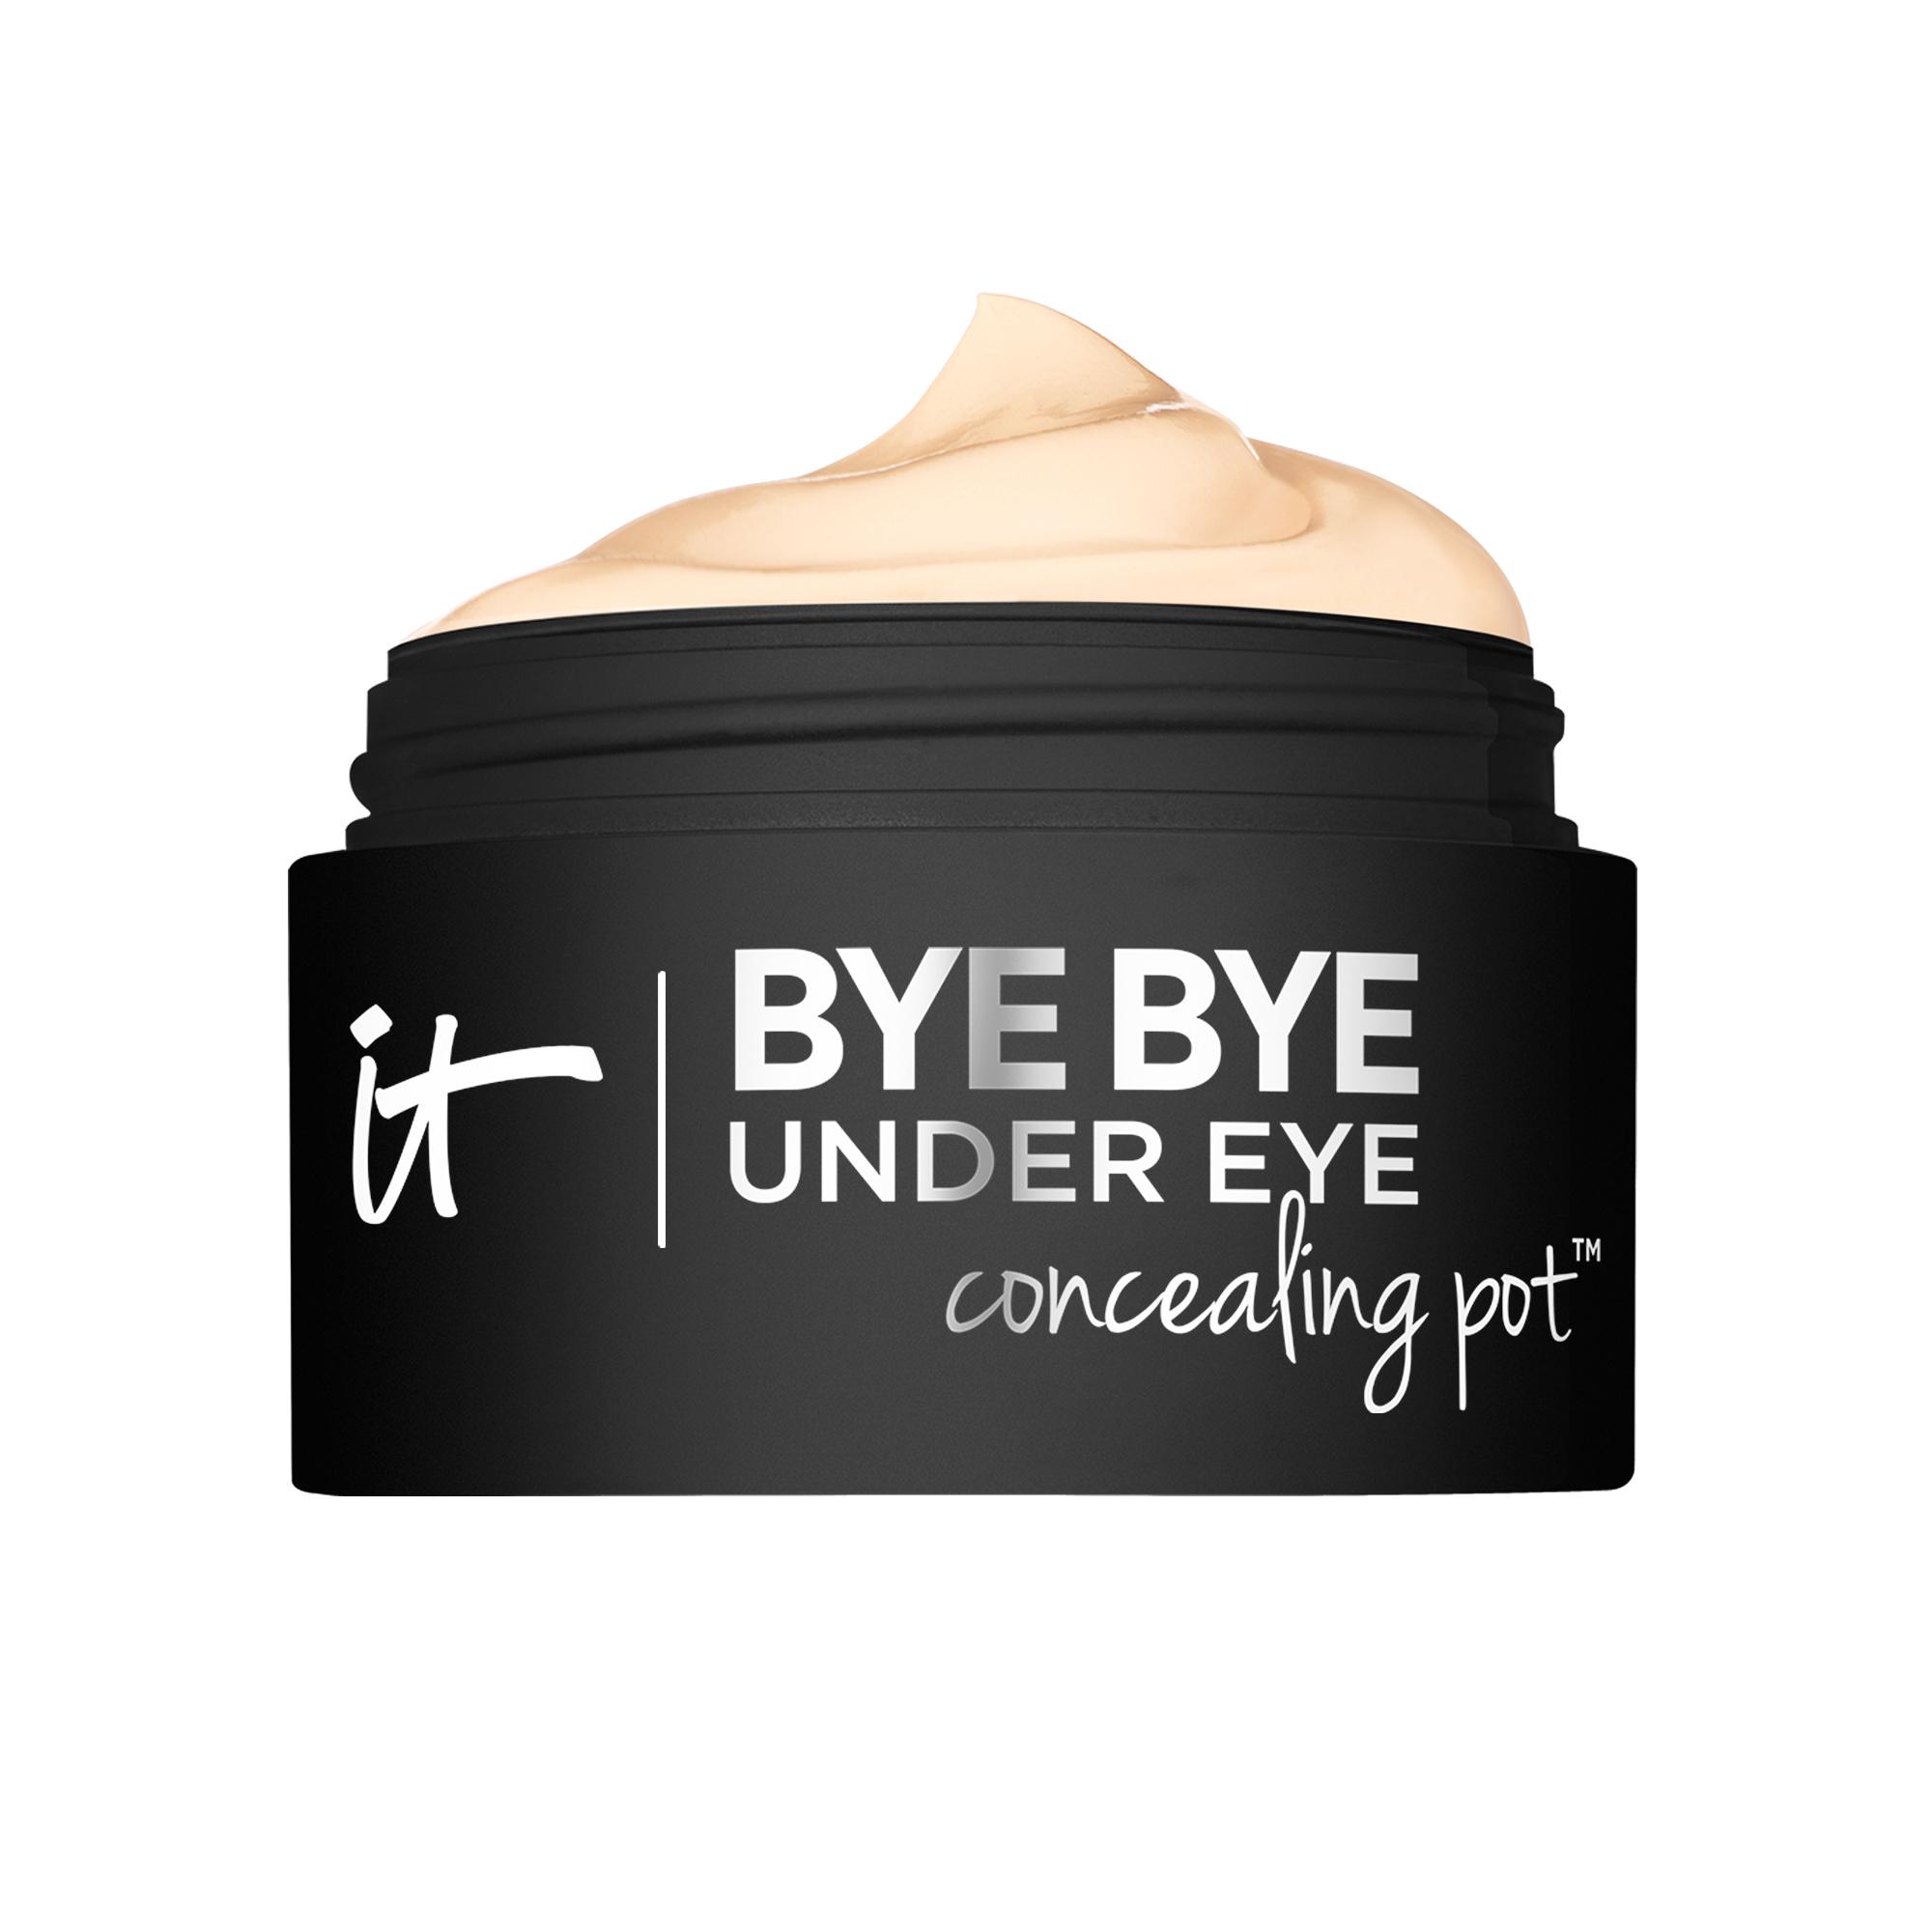 Bye Bye Under Eye™ Concealing Pot